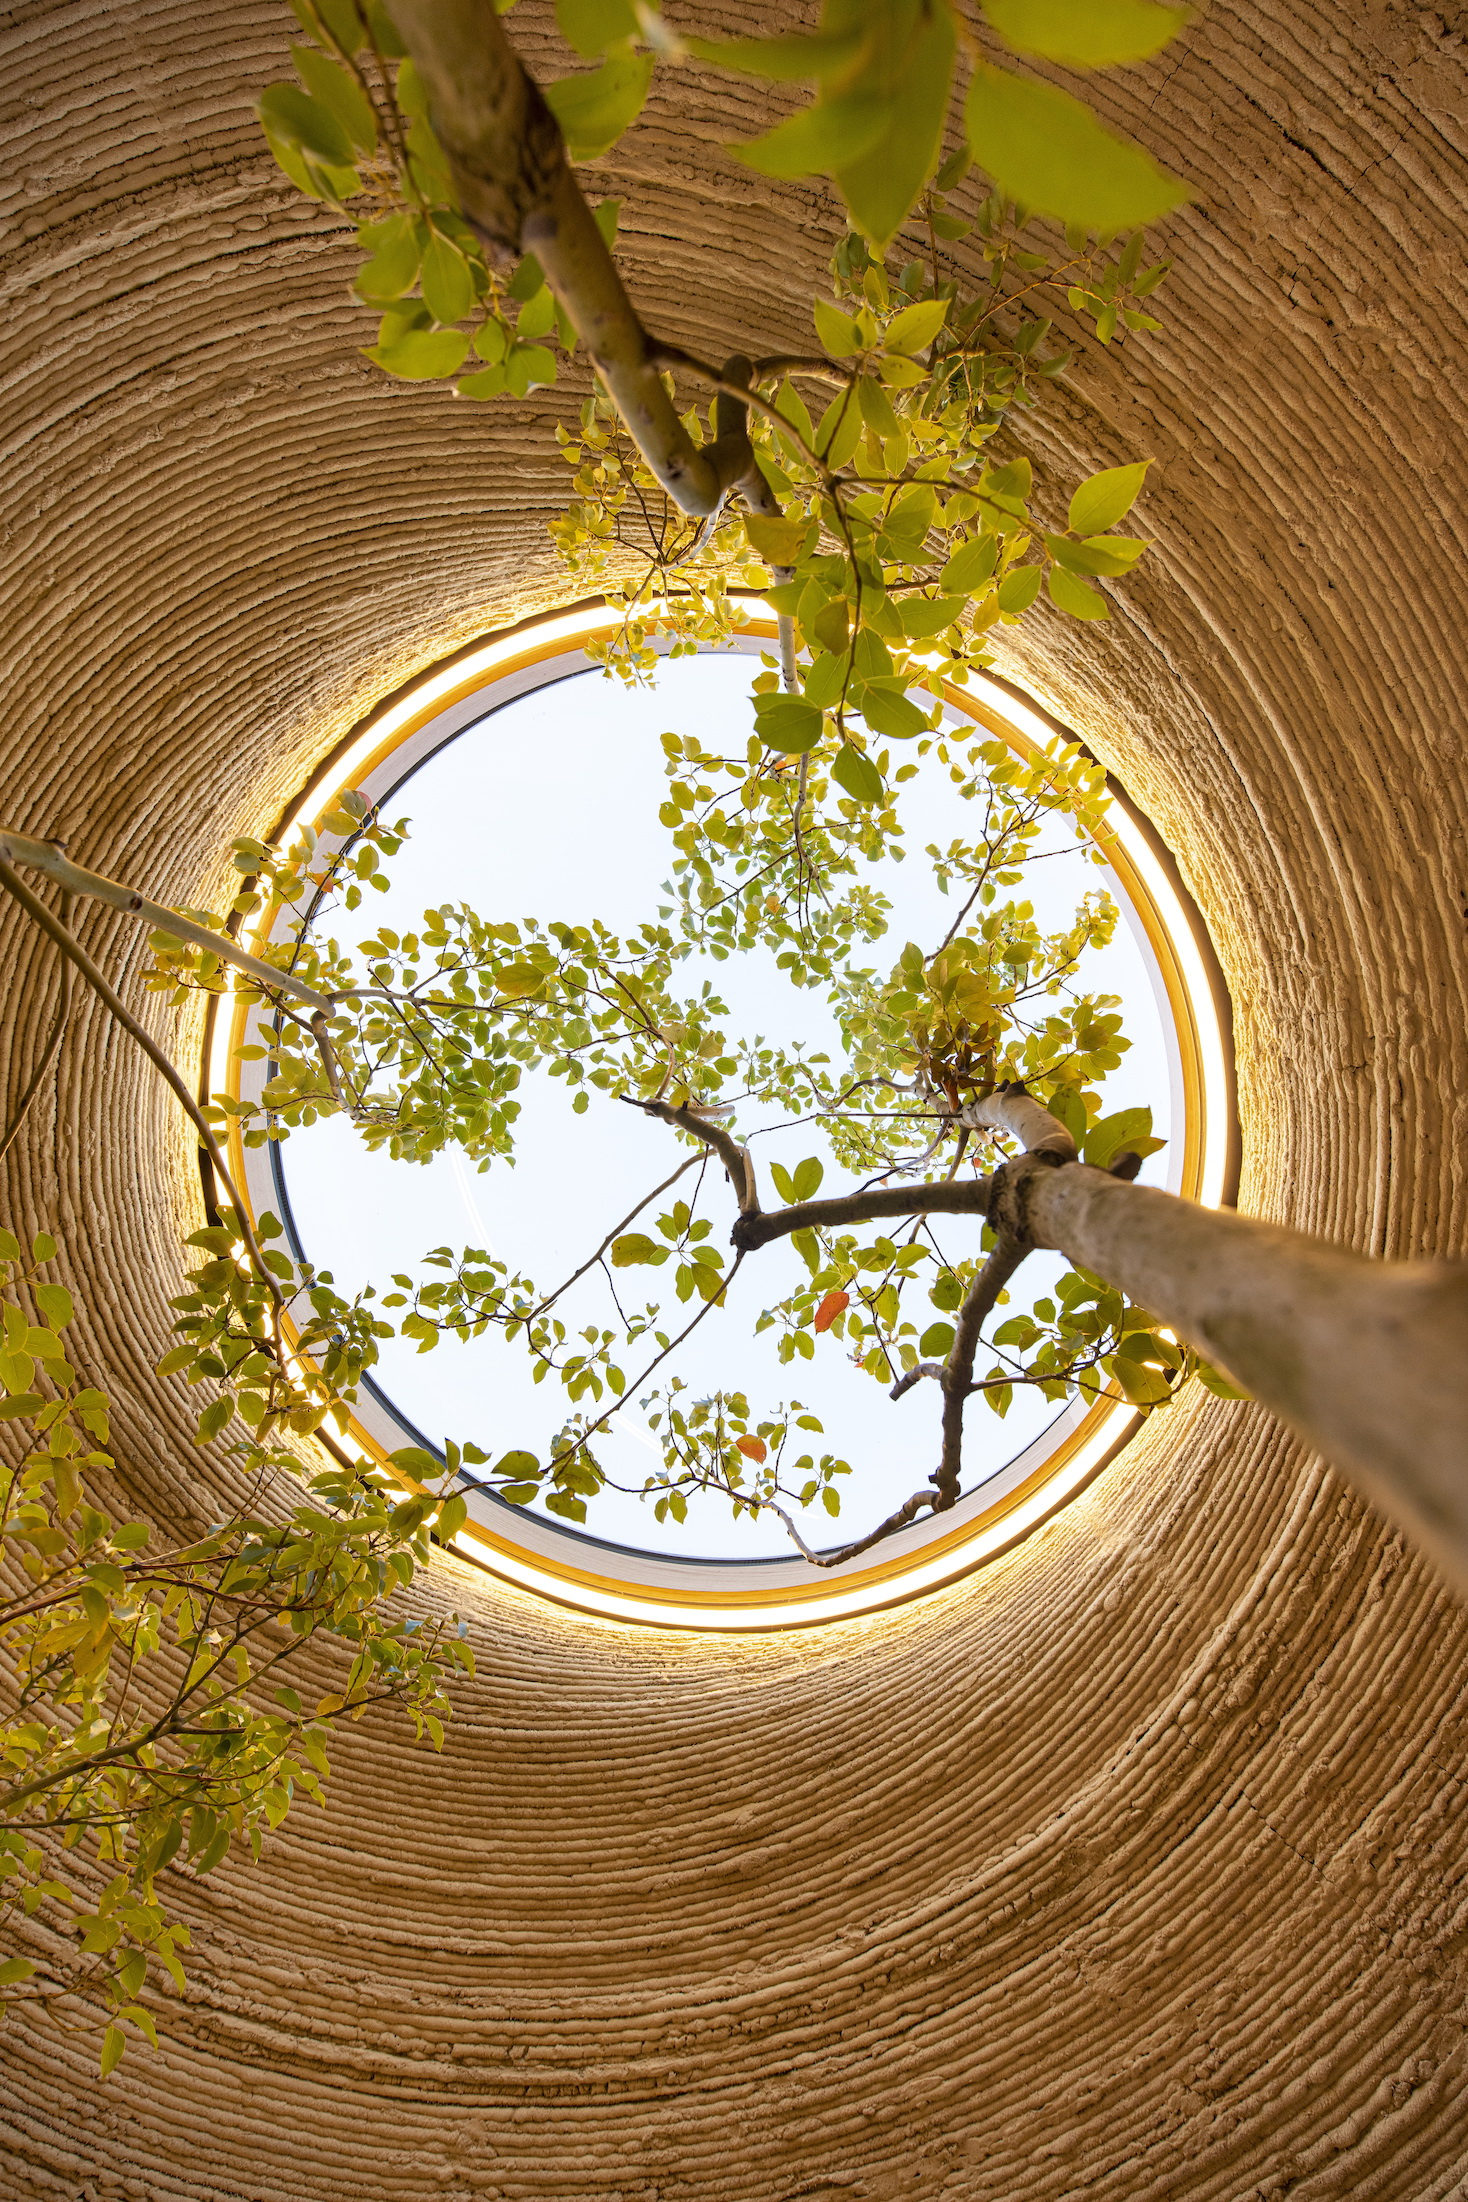 Mario Cucinella Architects, TECLA, Ravenna, 2021, Living Area Skylight Detail, Photo by Iago Corazza